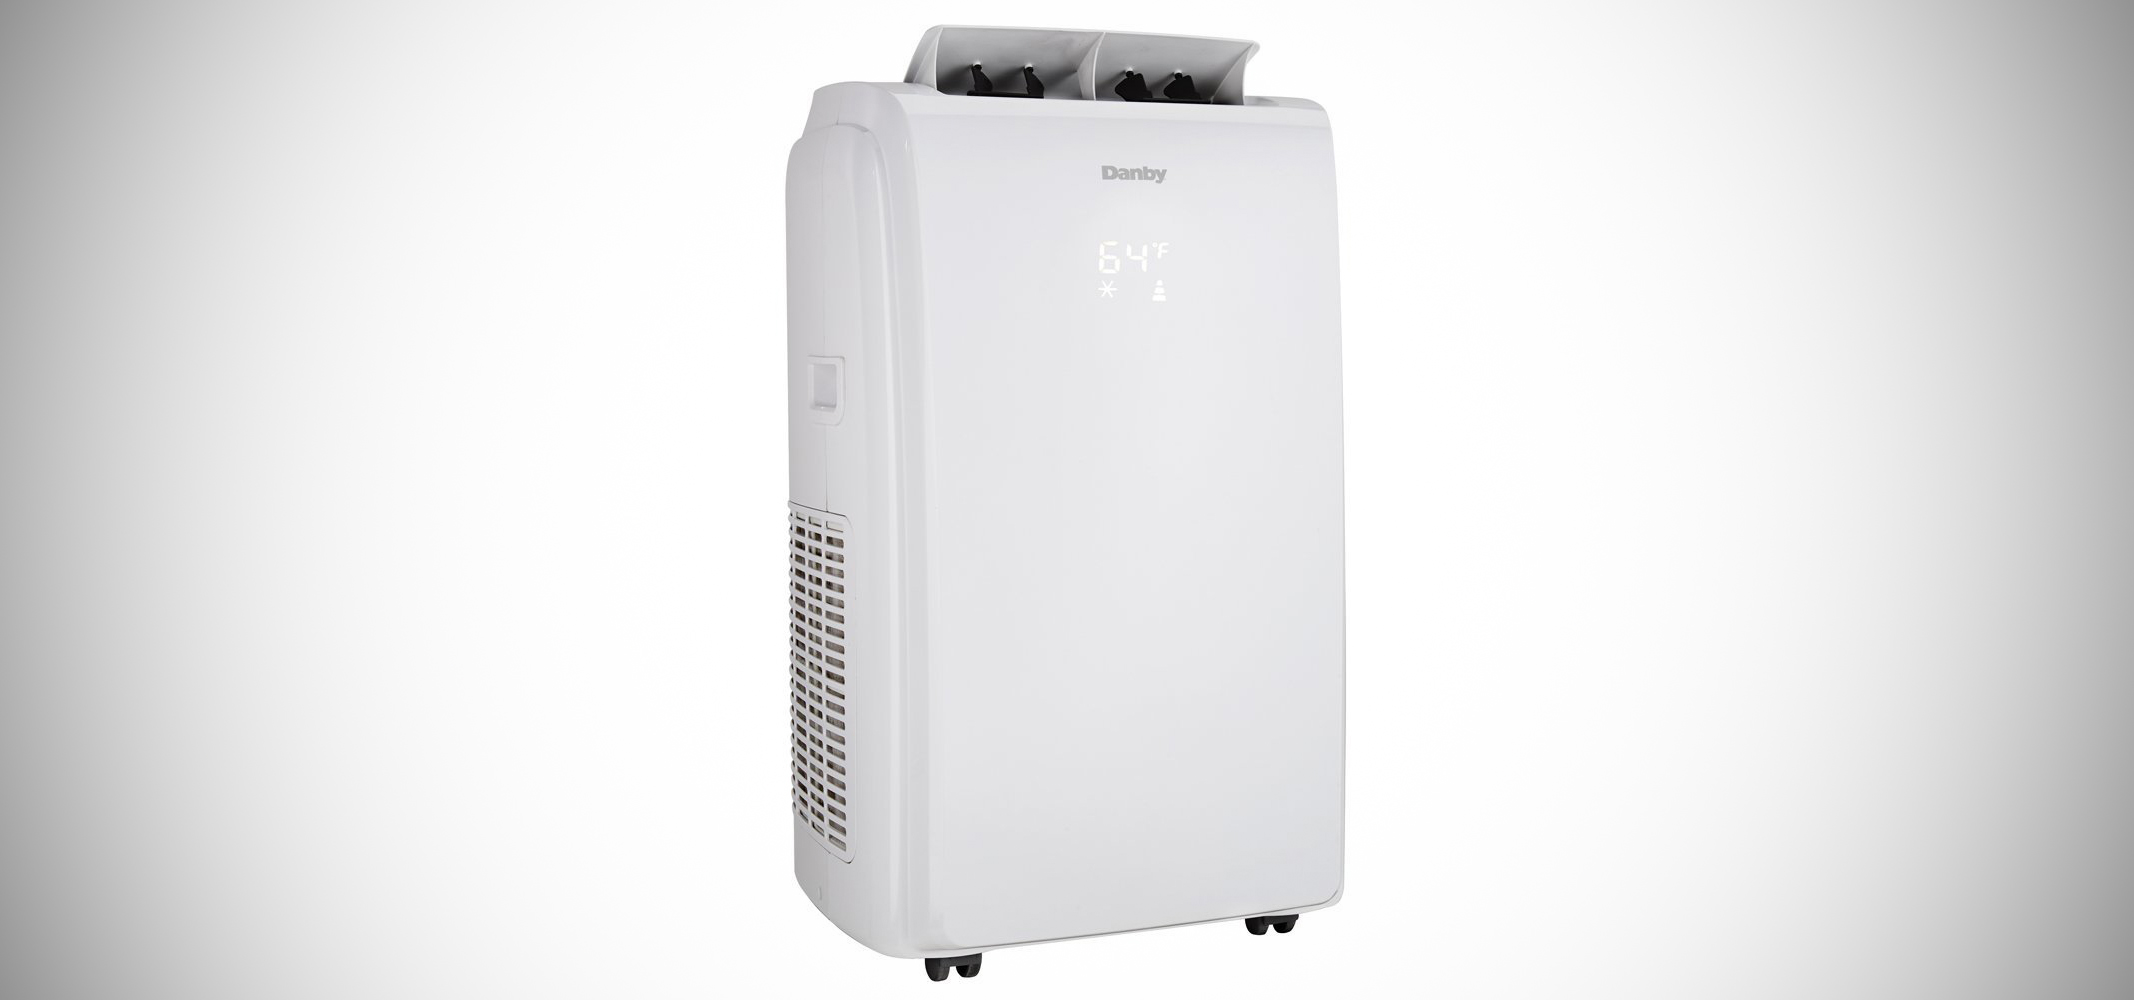 Danby 10000 BTU Portable Air Conditioner Review